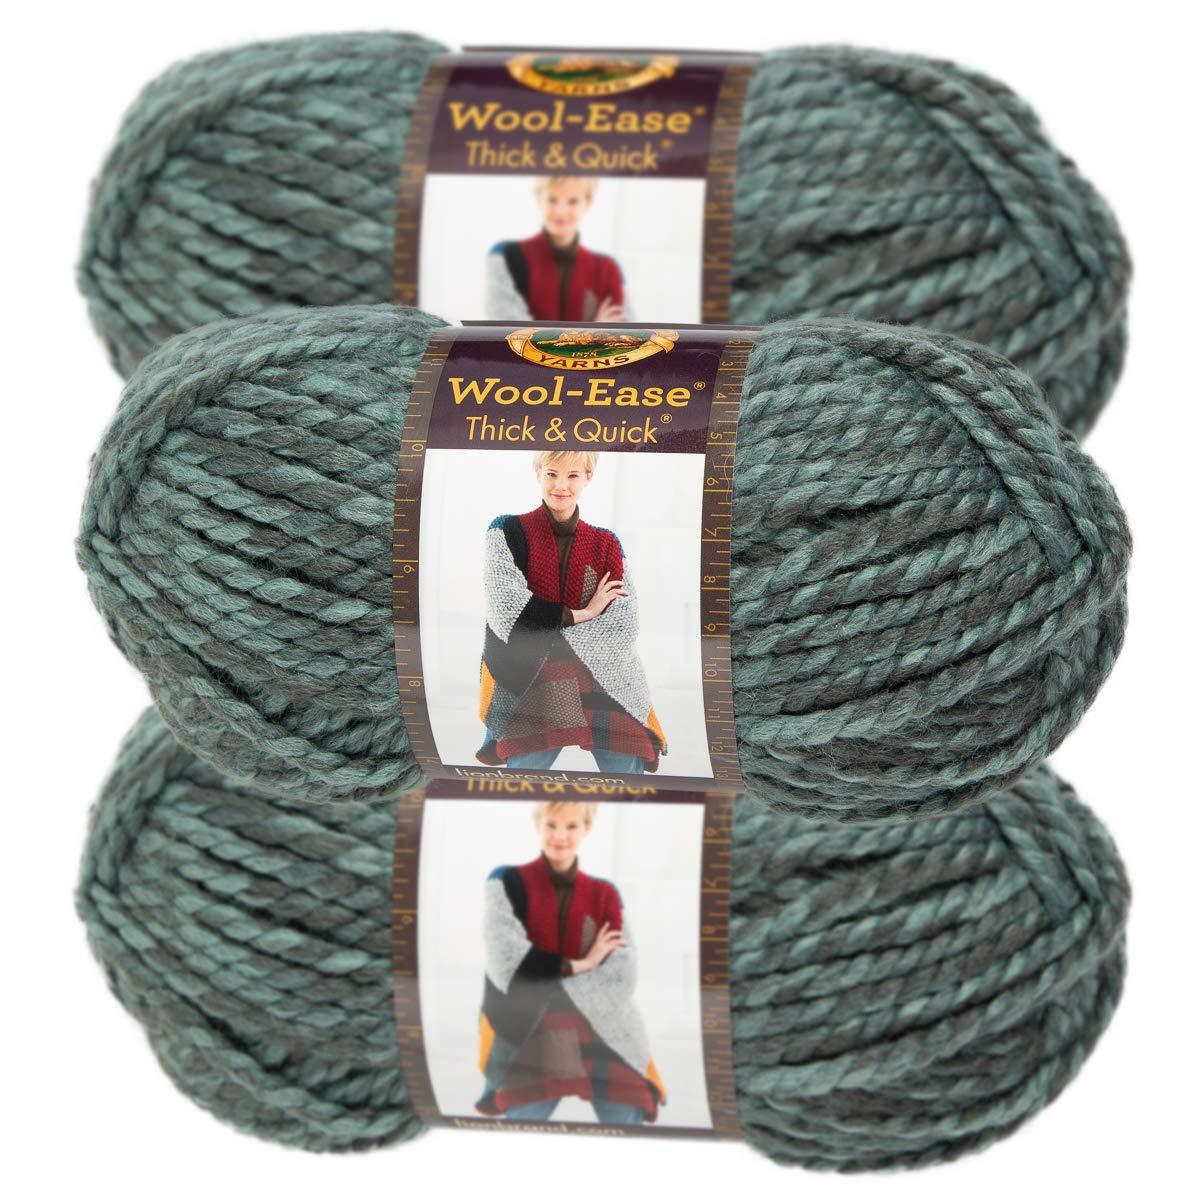 Lion Brand Yarn 3 Pack Wool Ease Super Chunky Yarn for Knitting Crocheting Soft Blue Jay Yarn Bulky #6